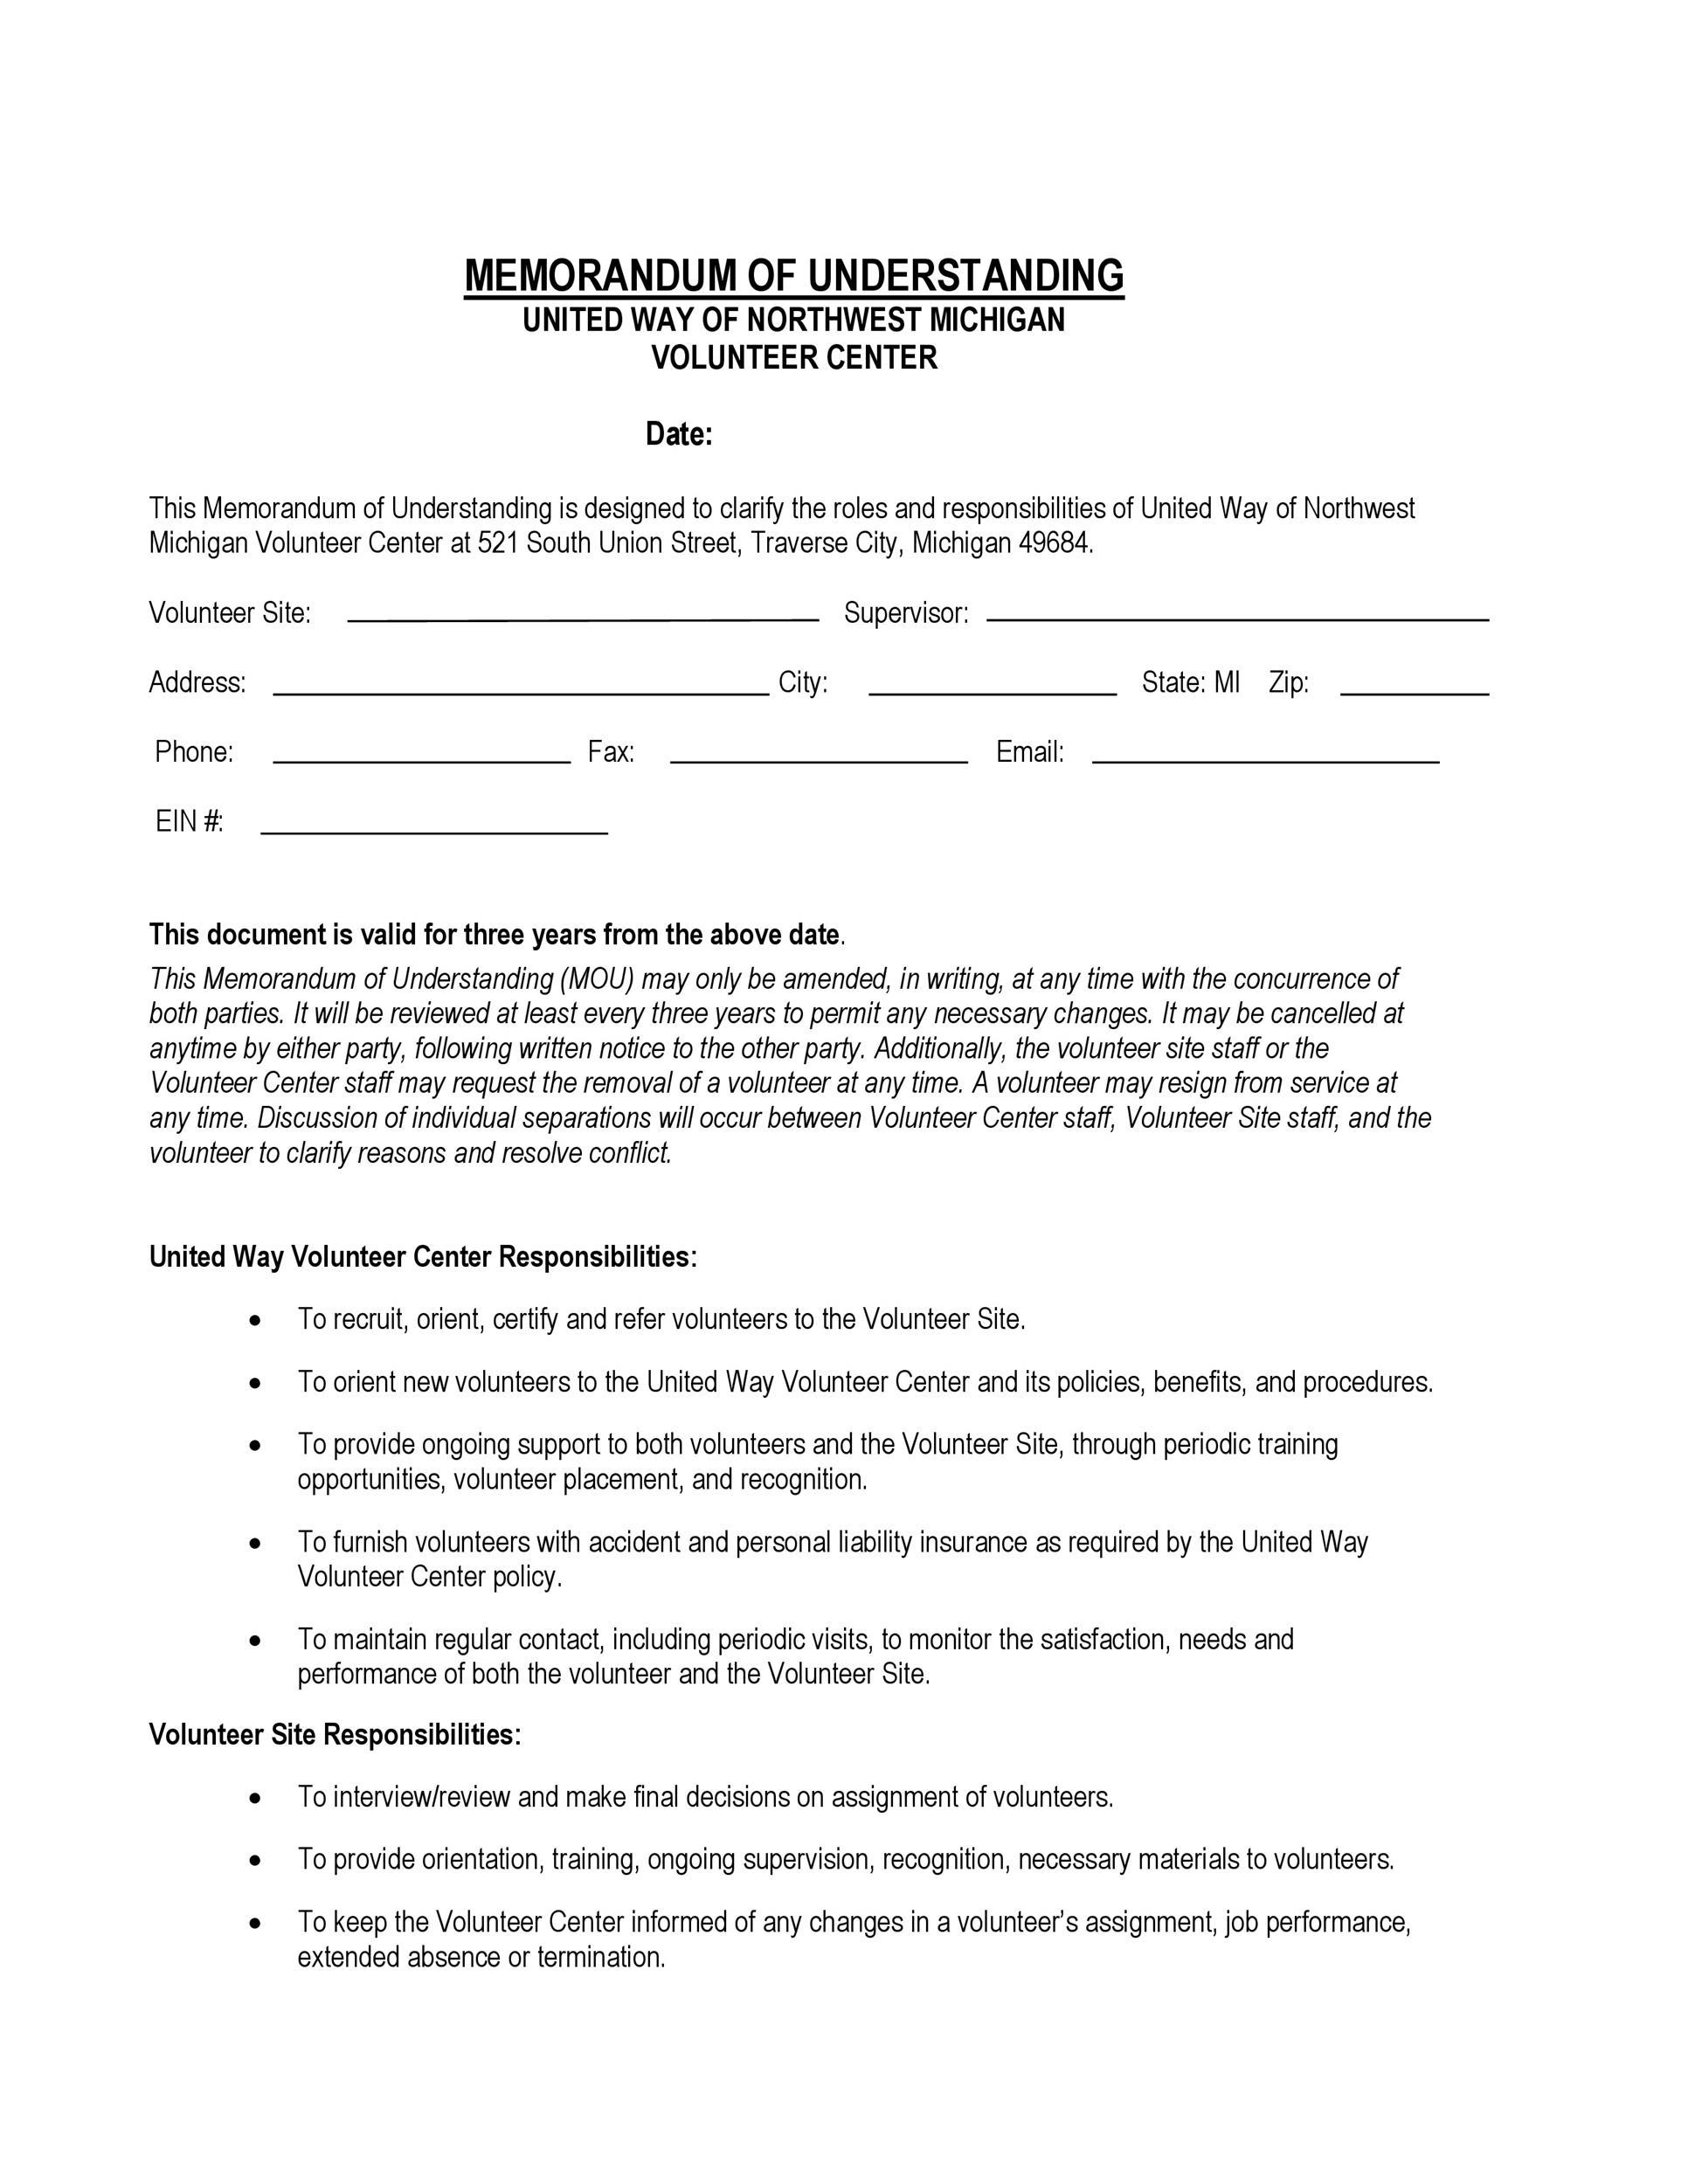 Free Memorandum of Understanding Template 38